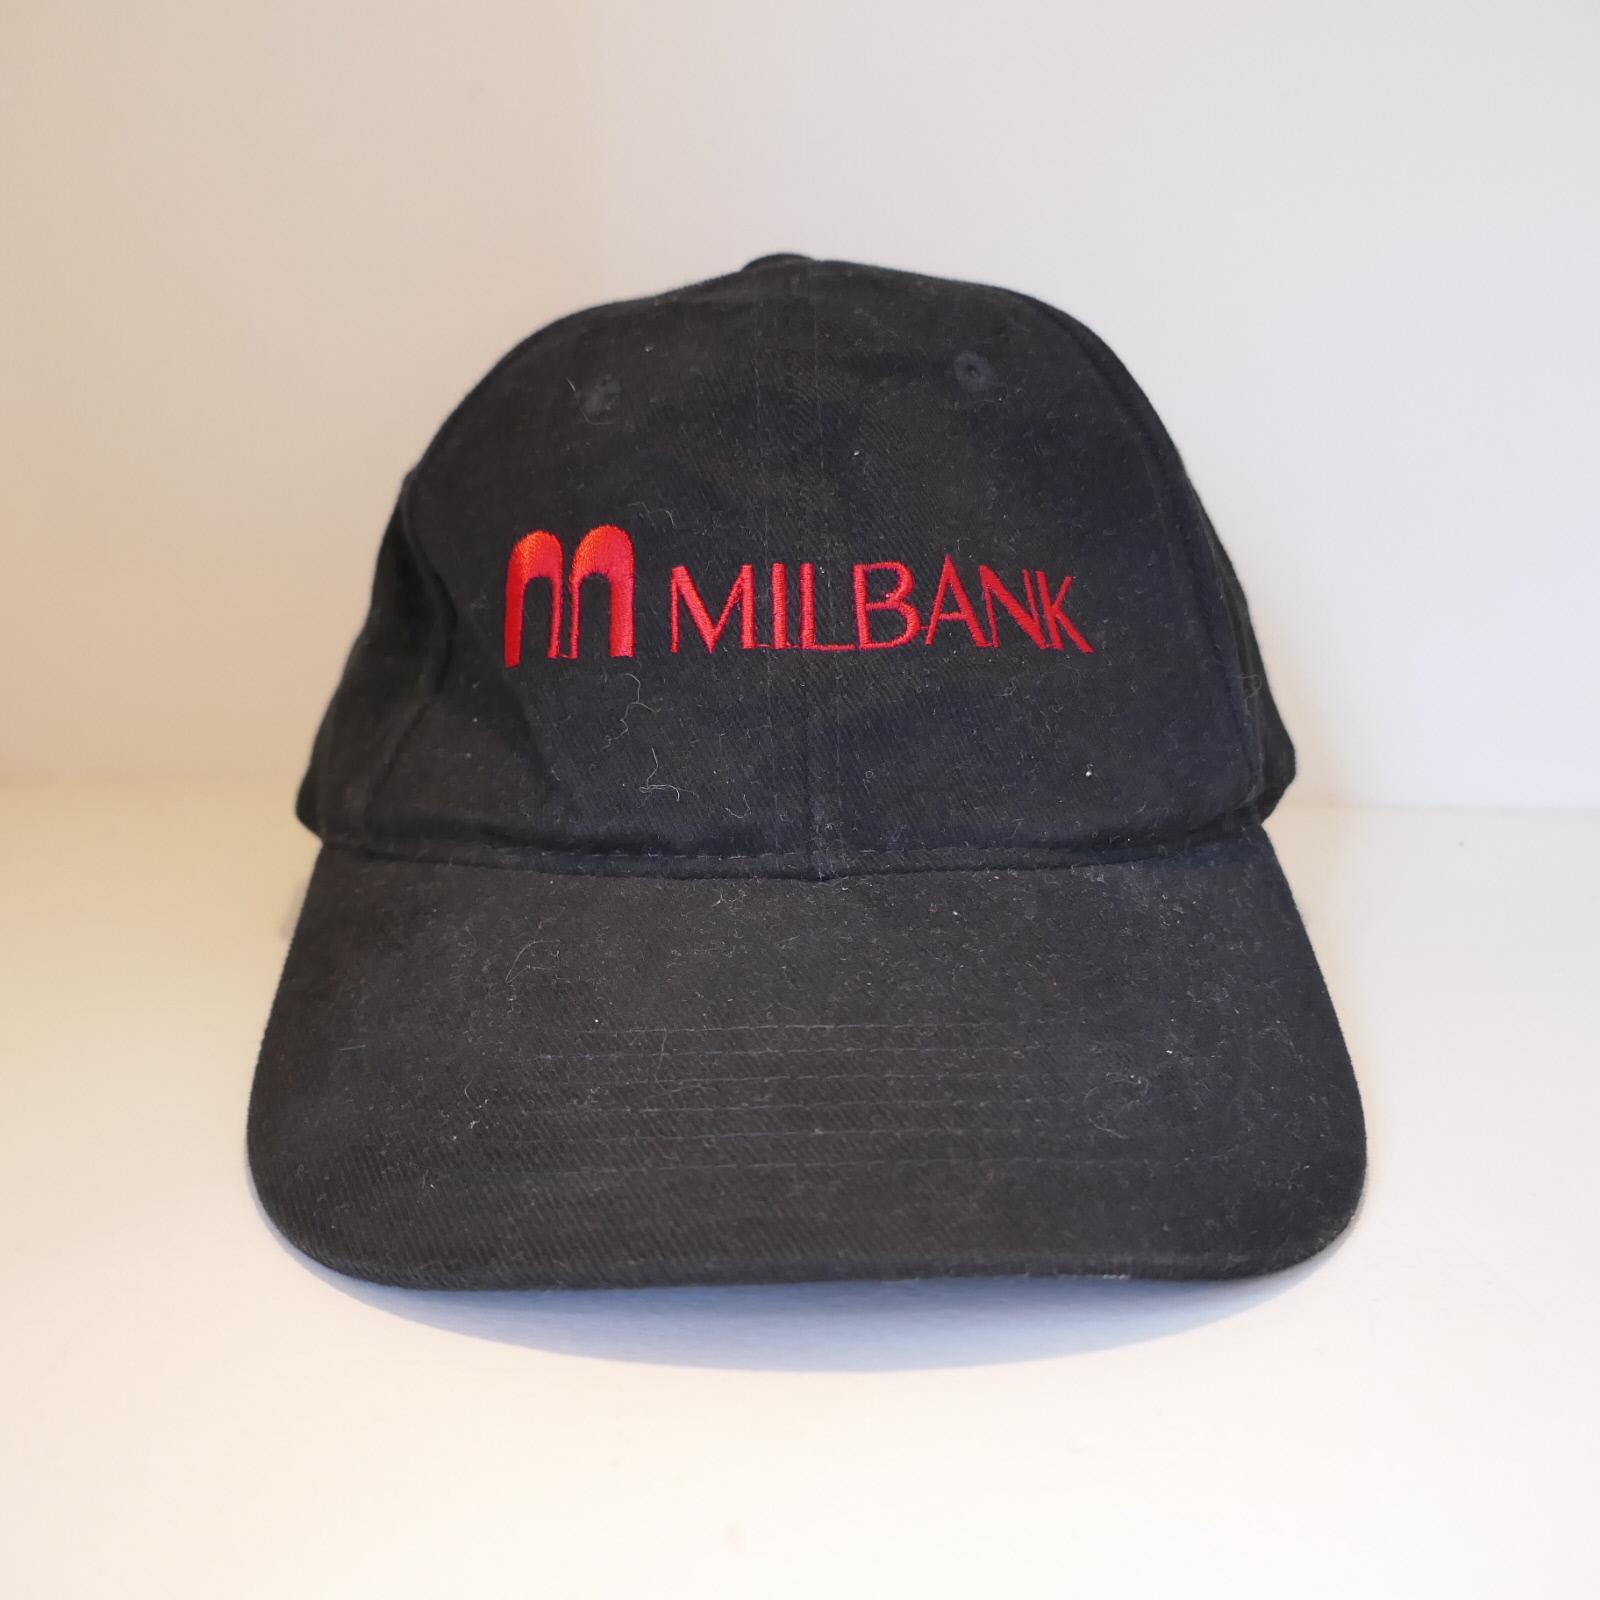 USED MILBANK LOGO CAP BLACK